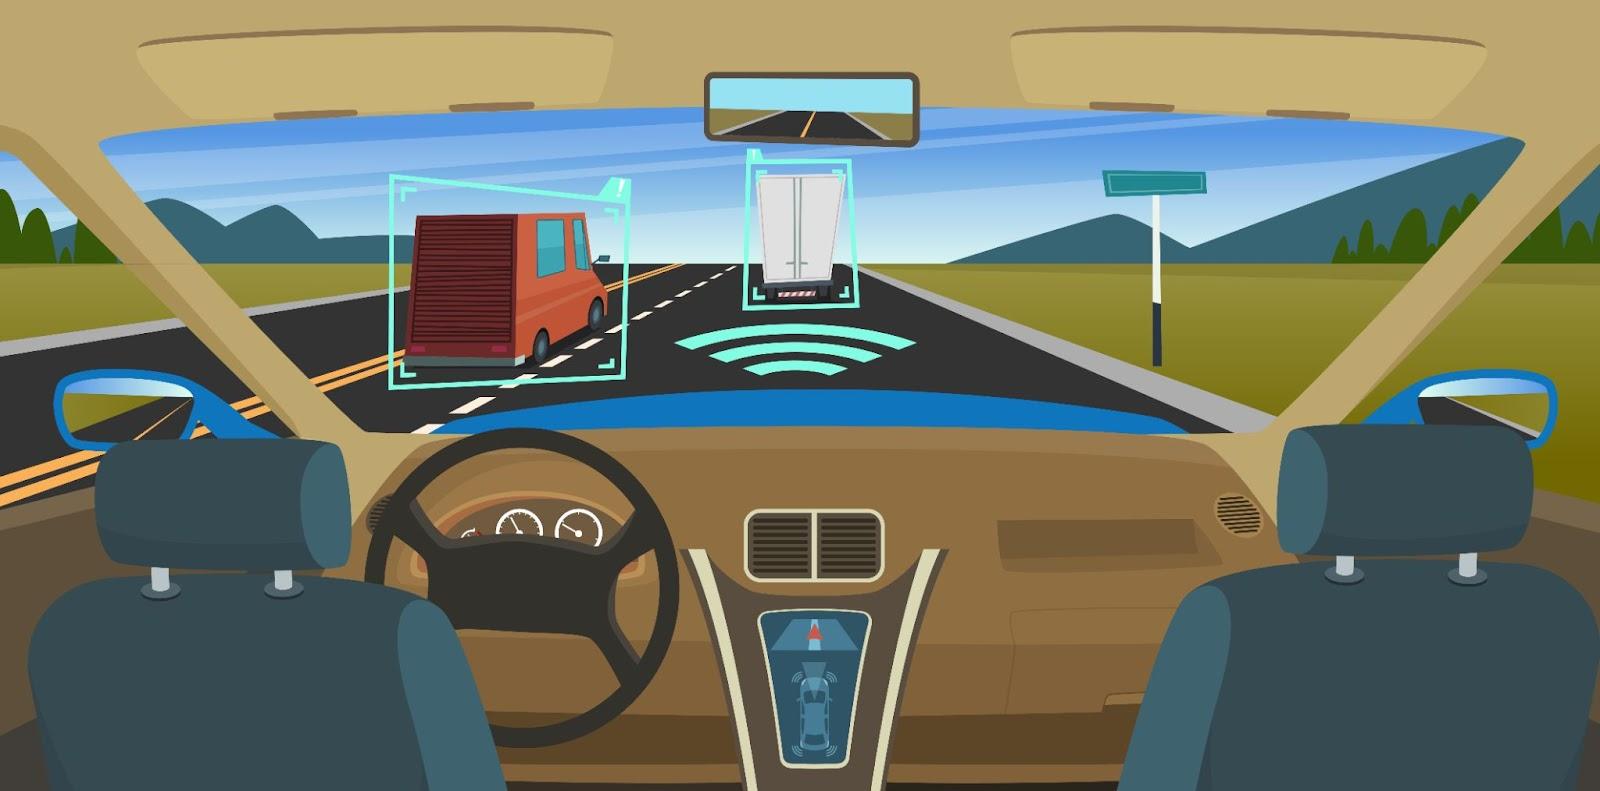 Perception in self-driving car